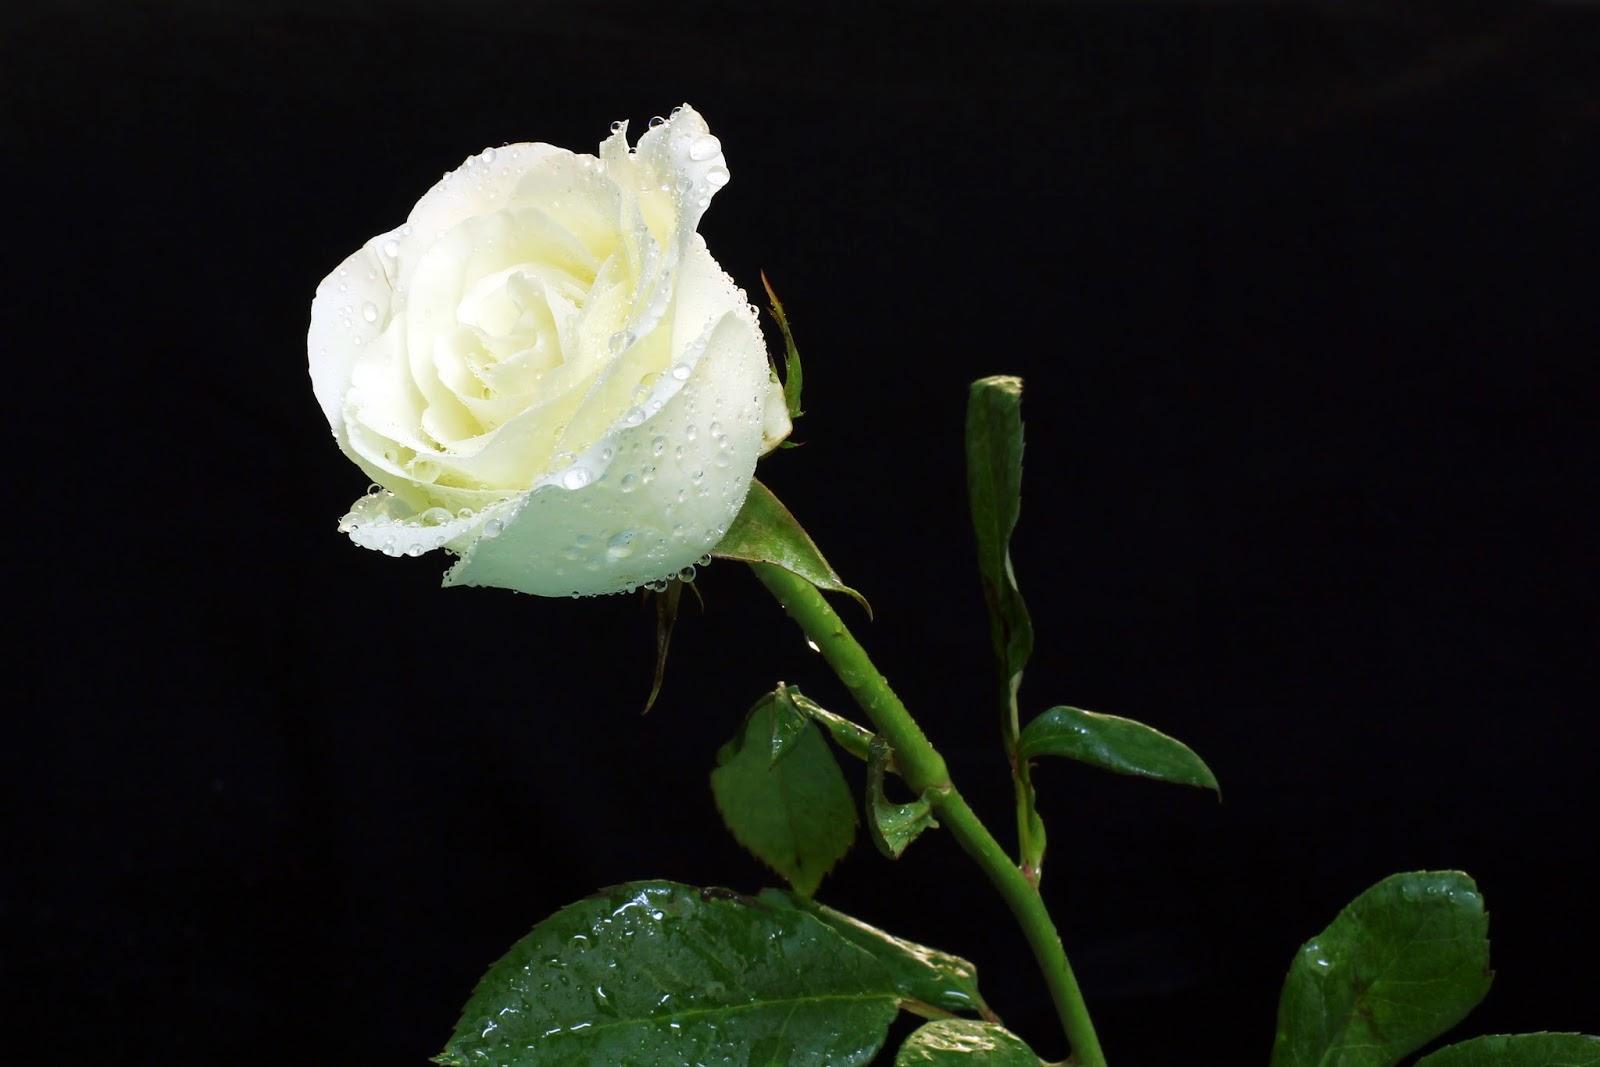 kumpulan gambar bunga mawar putih yang cantik indah blog